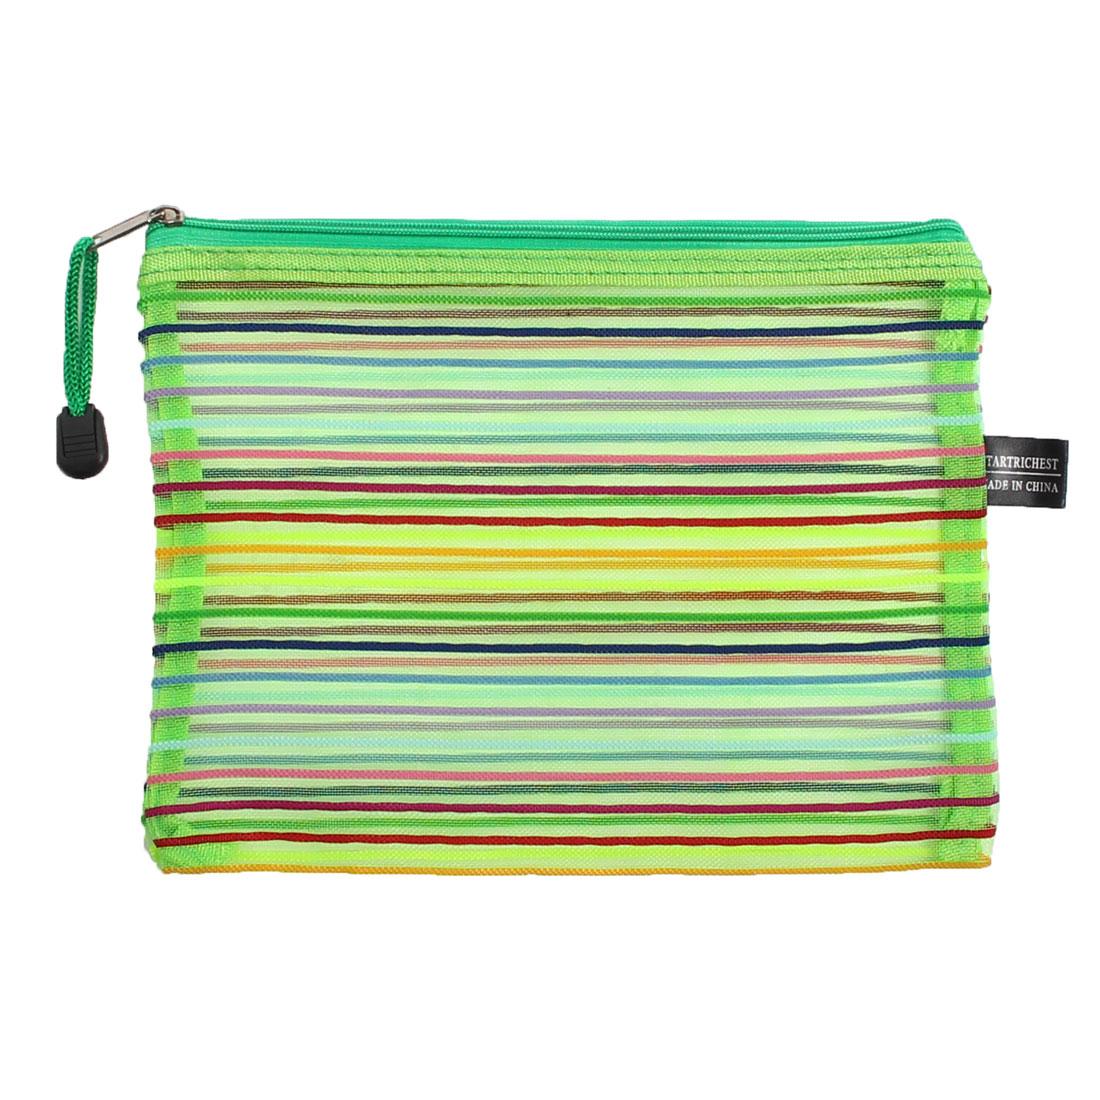 Nylon Multicolor Stripes Zipper Closure A5 Paper Documents Pen File Bag Folder